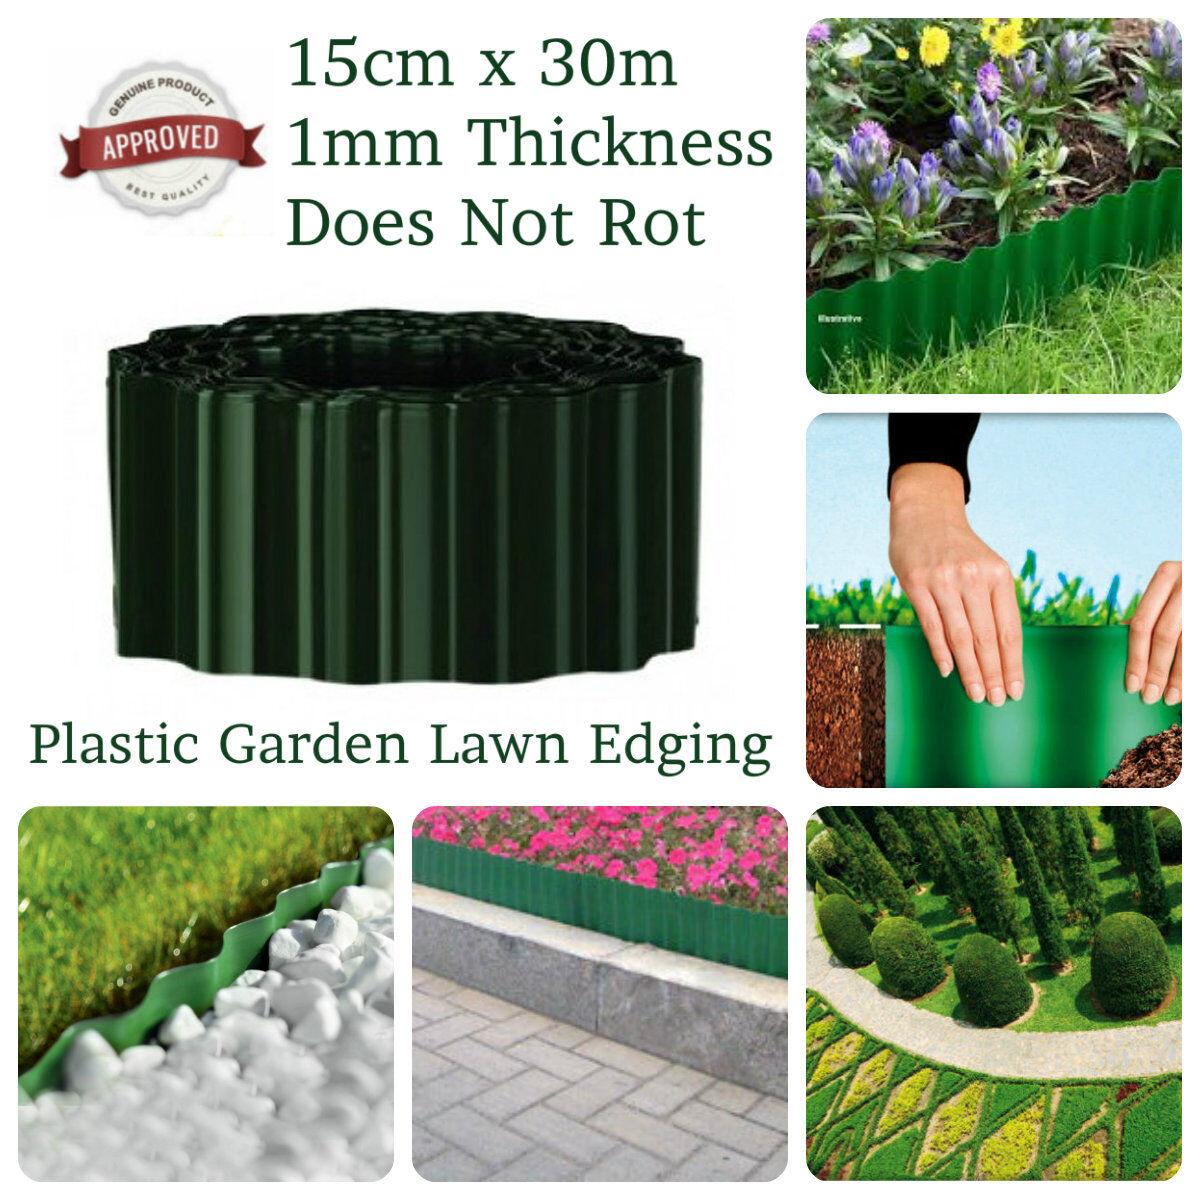 30m PLASTIC GARDEN GRASS LAWN BORDER EDGING BORDER FENCE WALL PATH DRIVEWAY R